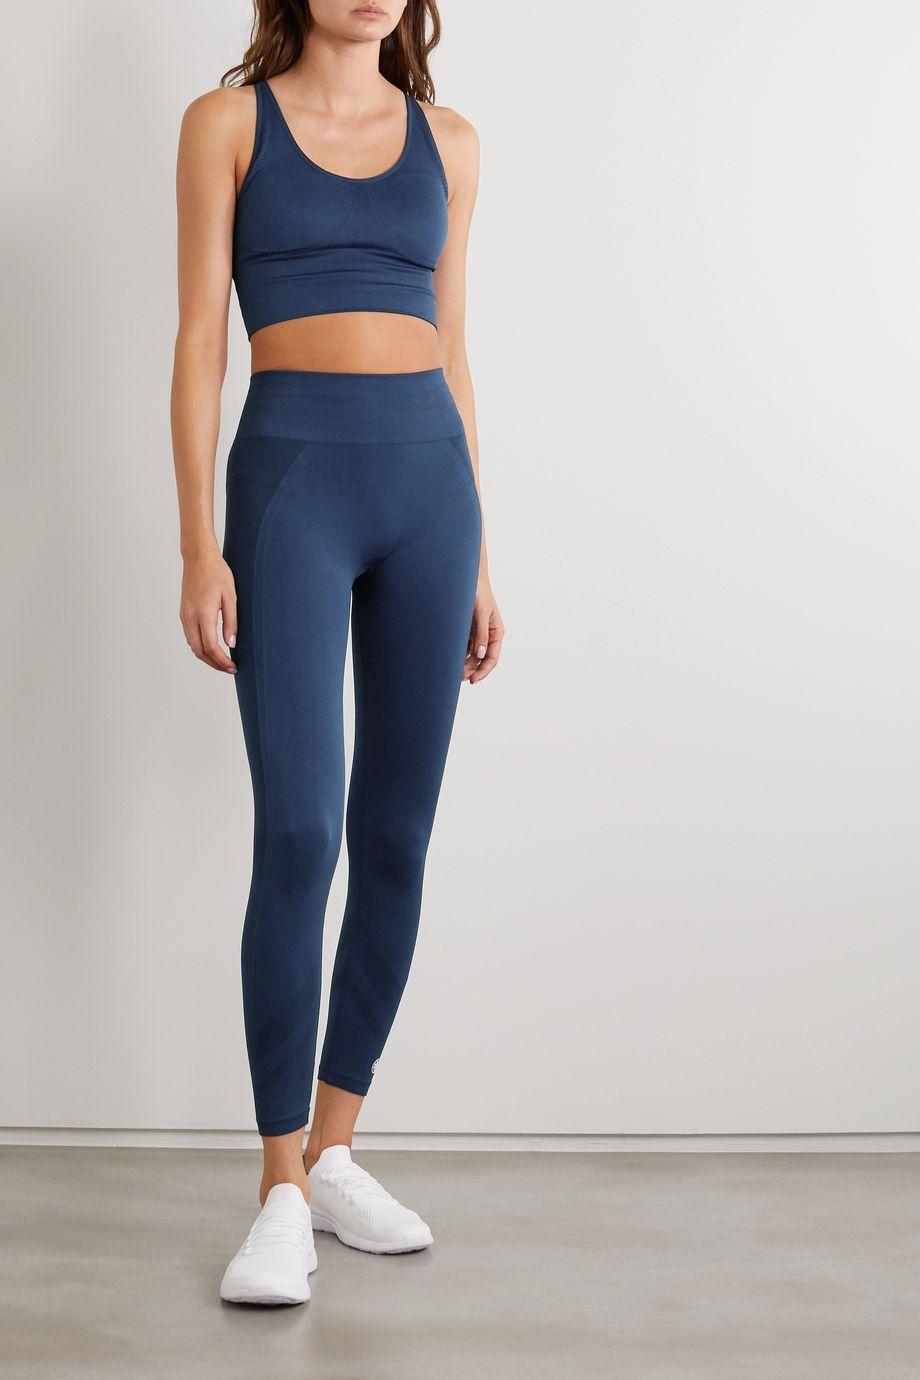 Tory Sport Seamless stretch leggings